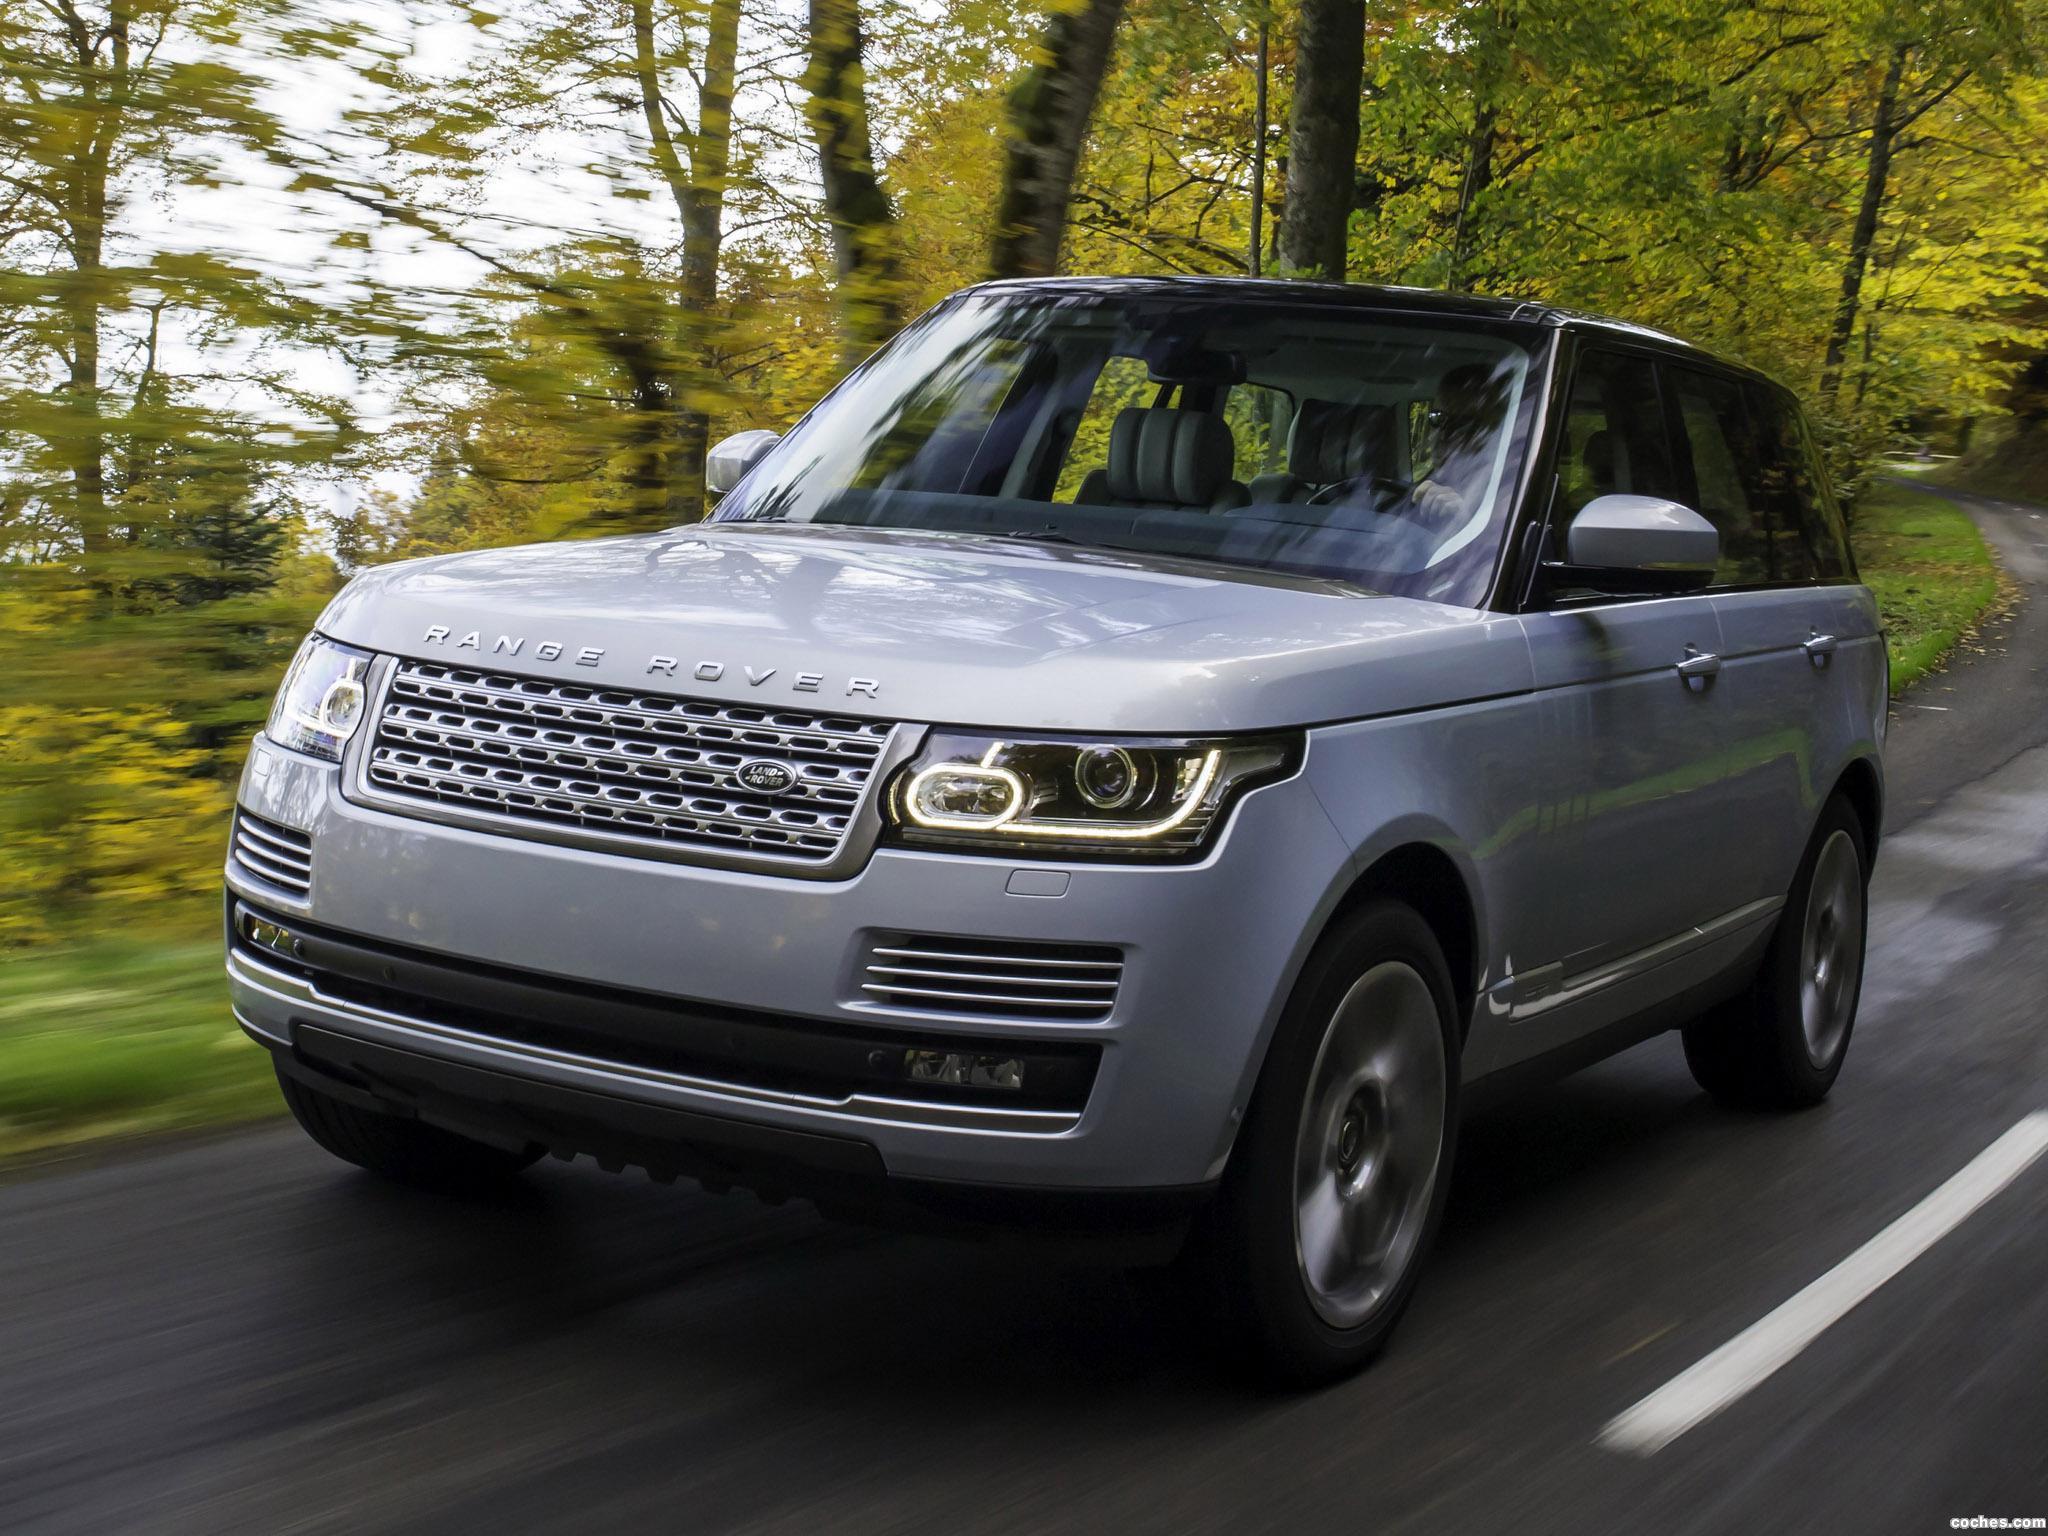 Foto 0 de Land Rover Range Rover Autobiography Hybrid 2014